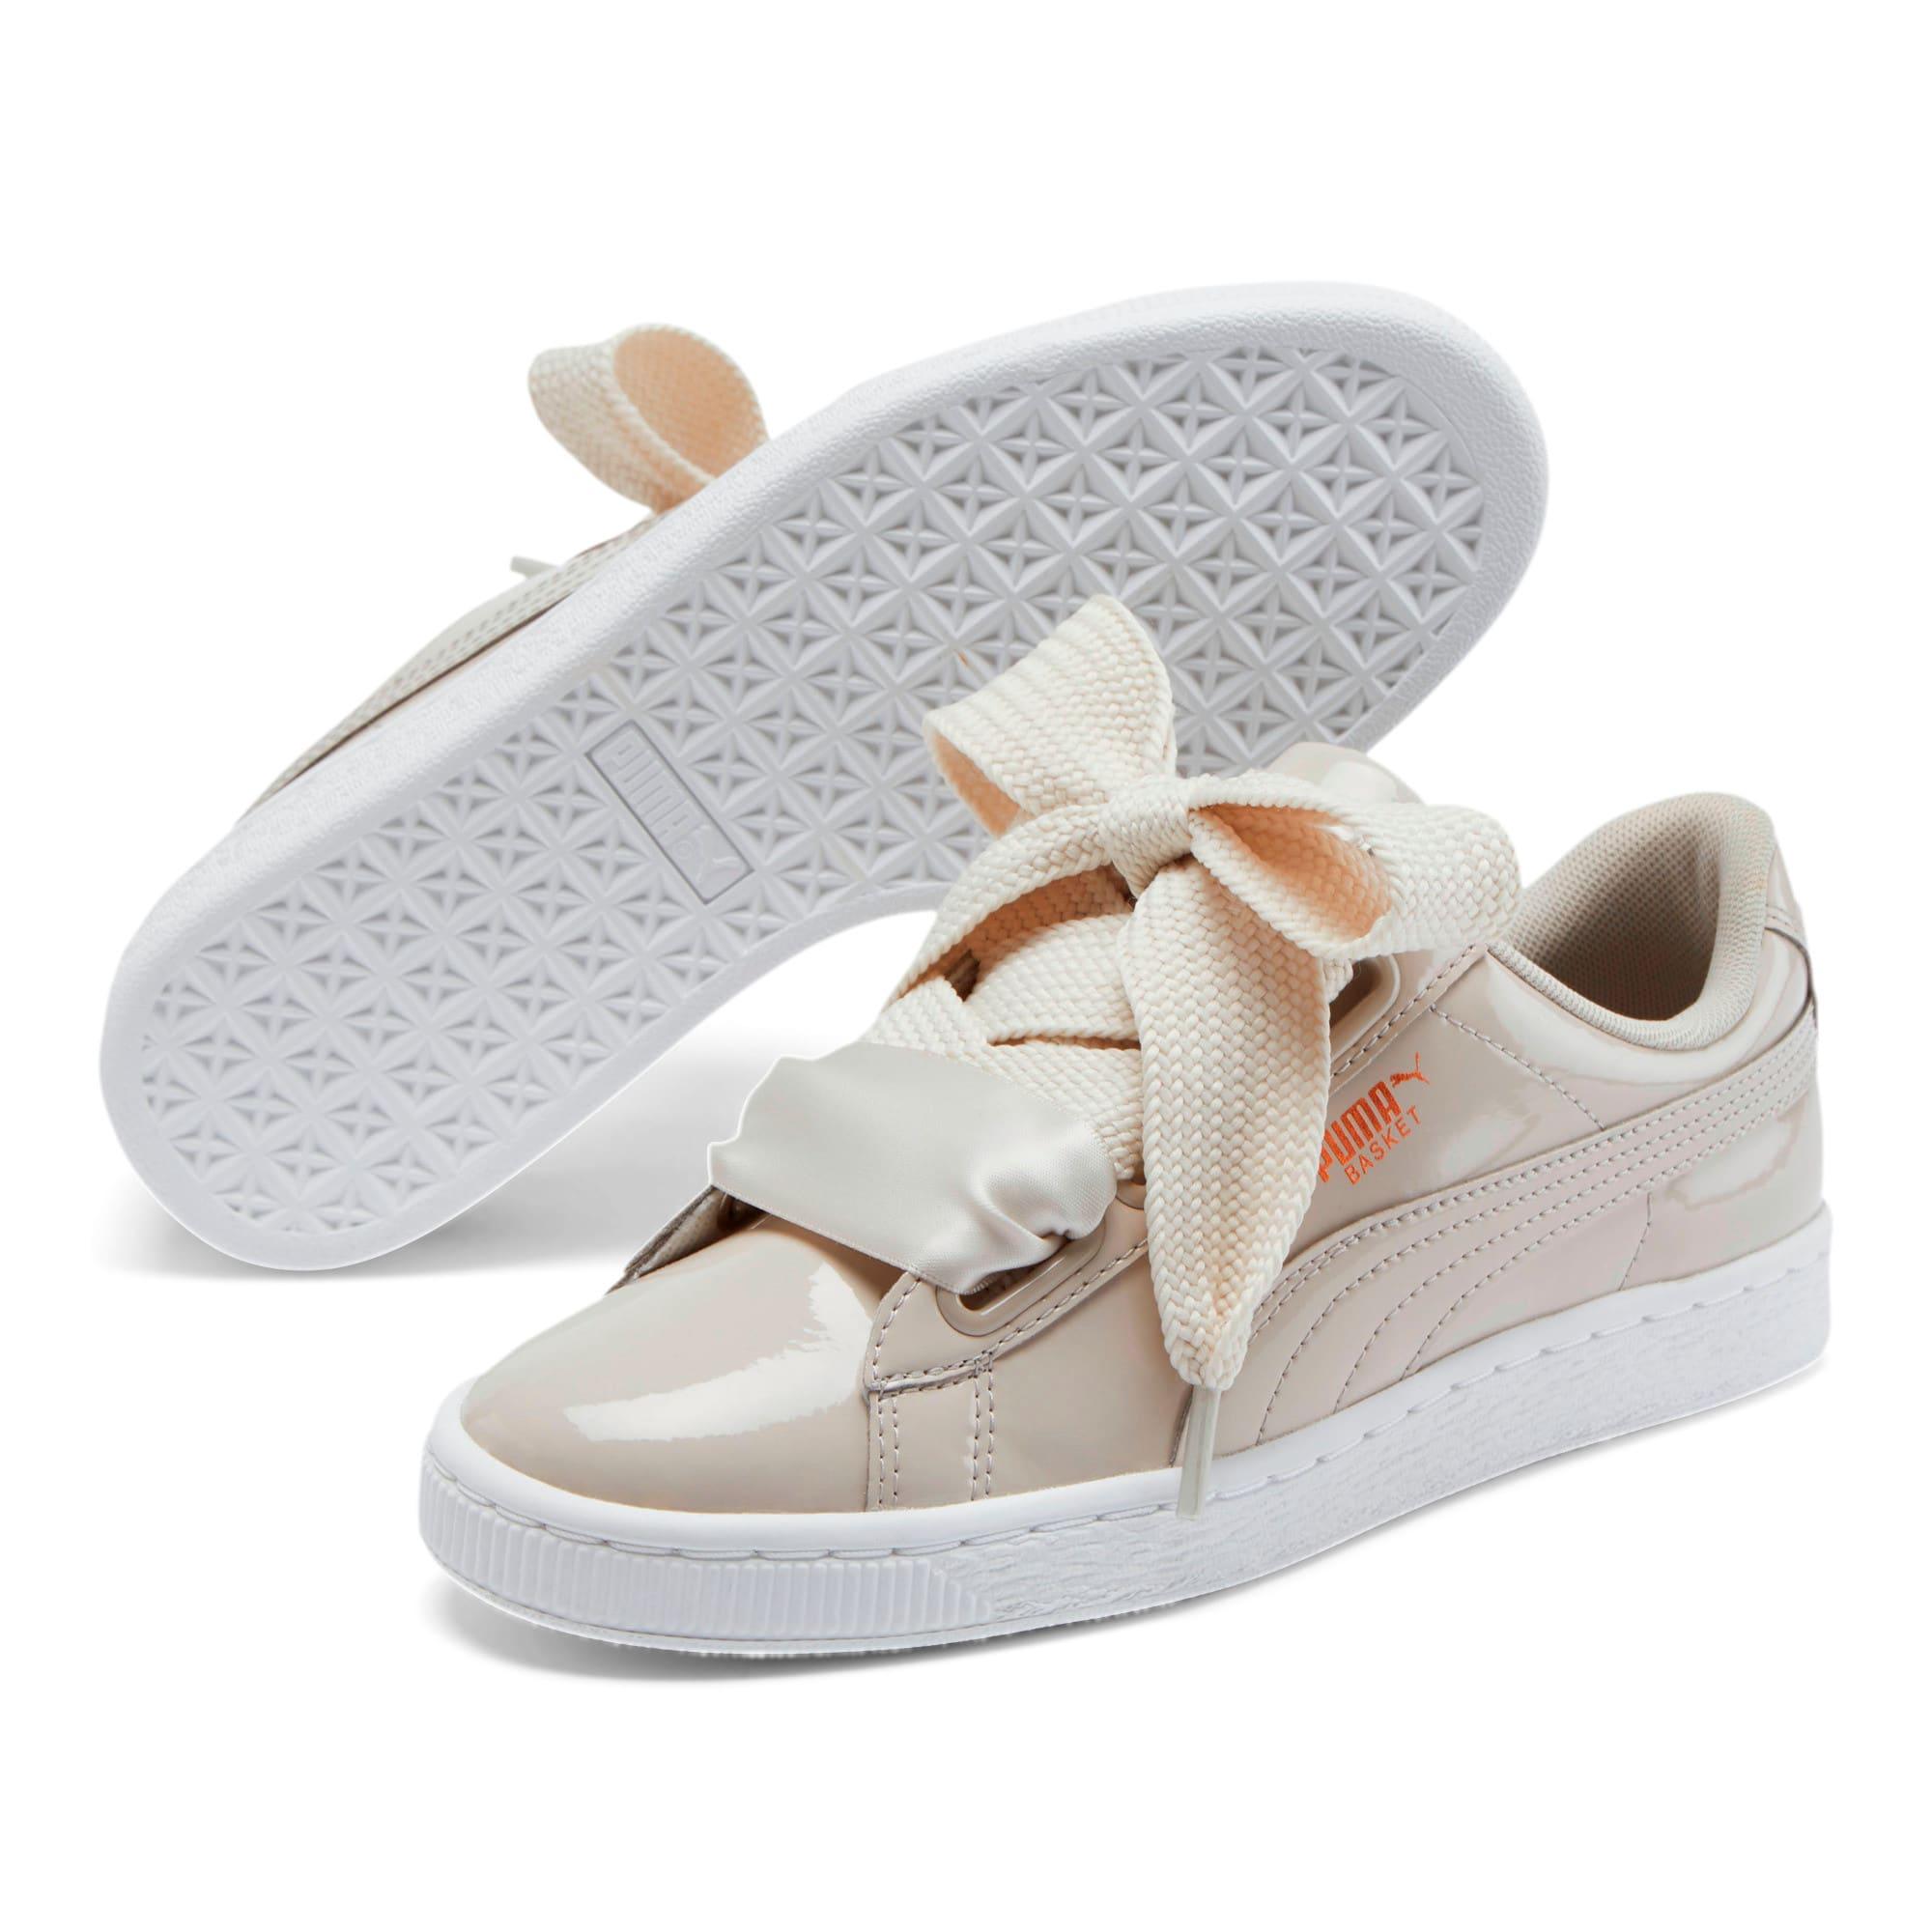 Thumbnail 2 of Basket Heart Patent Women's Sneakers, Silver Gray-Silver Gray, medium